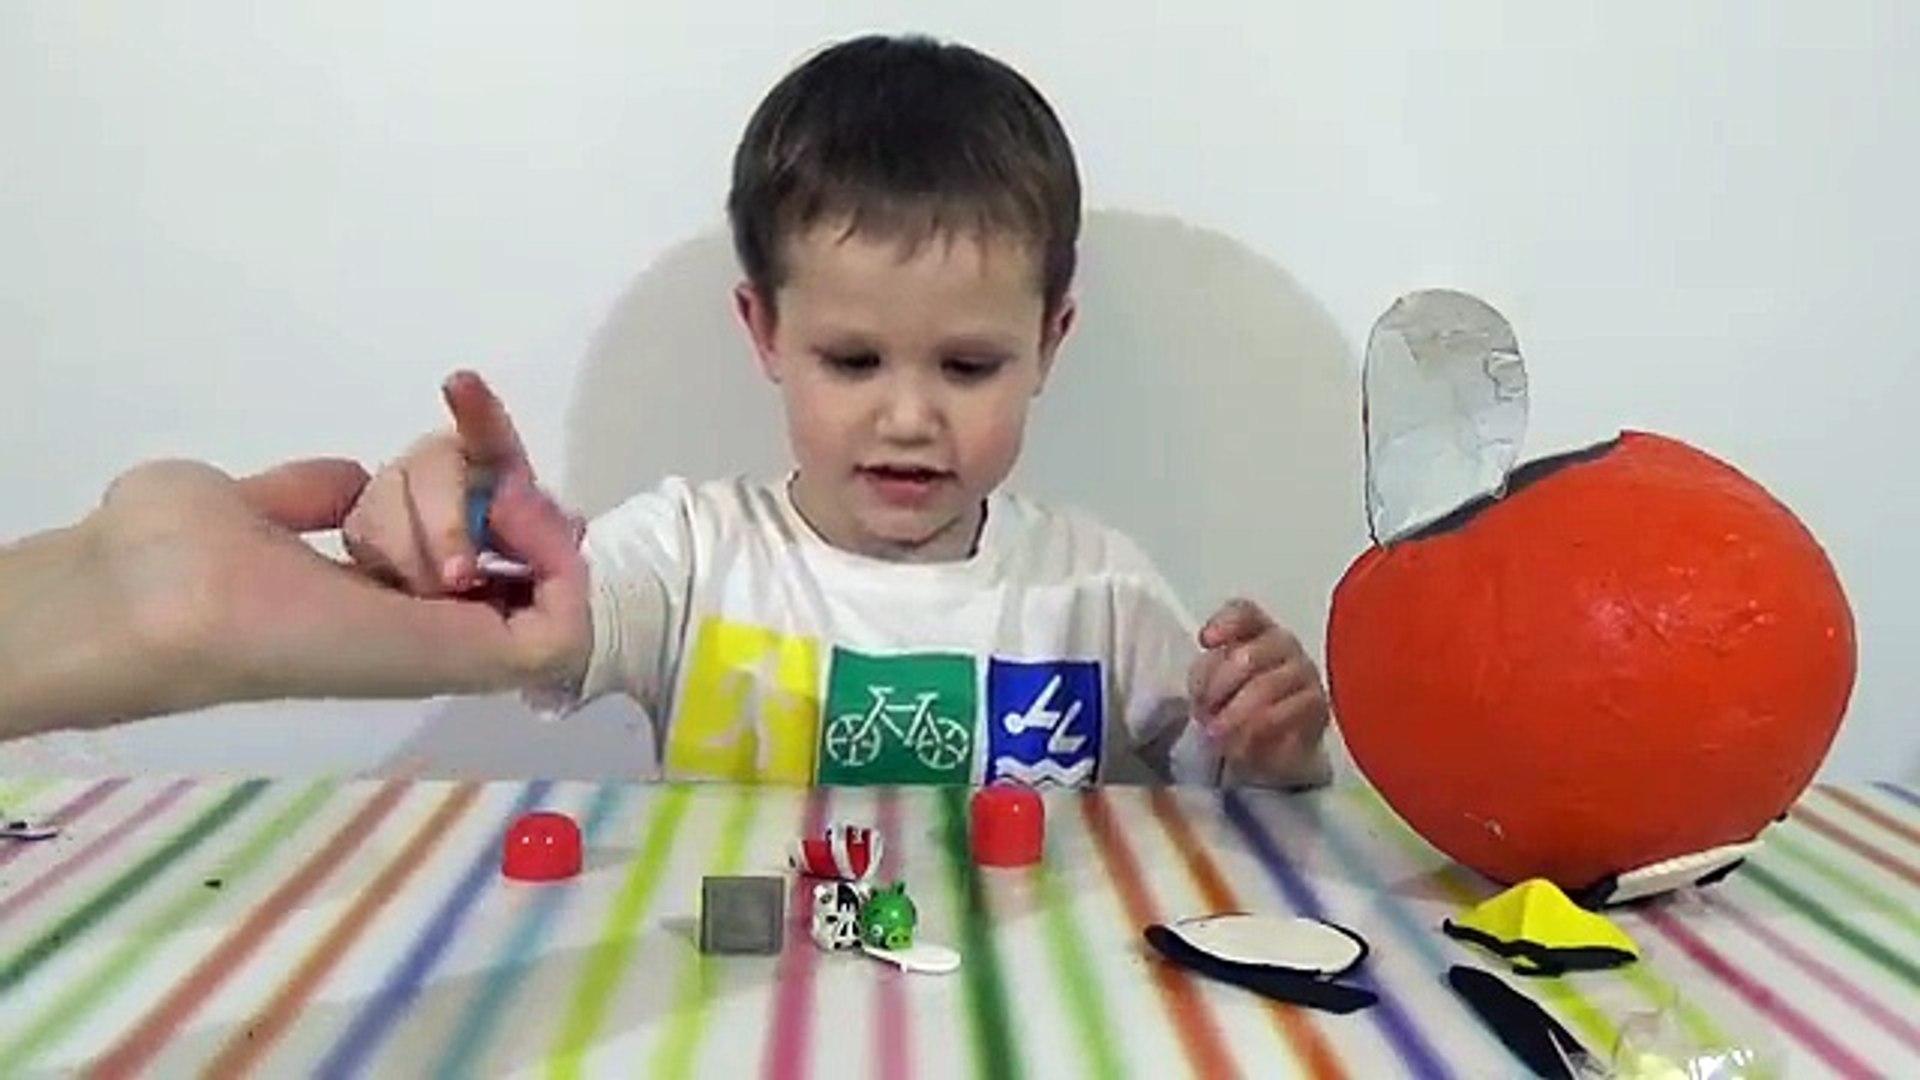 Huevo sorpresa gigante Angry Birds juguetes Géant de surprise œufs Angry Birds jouets